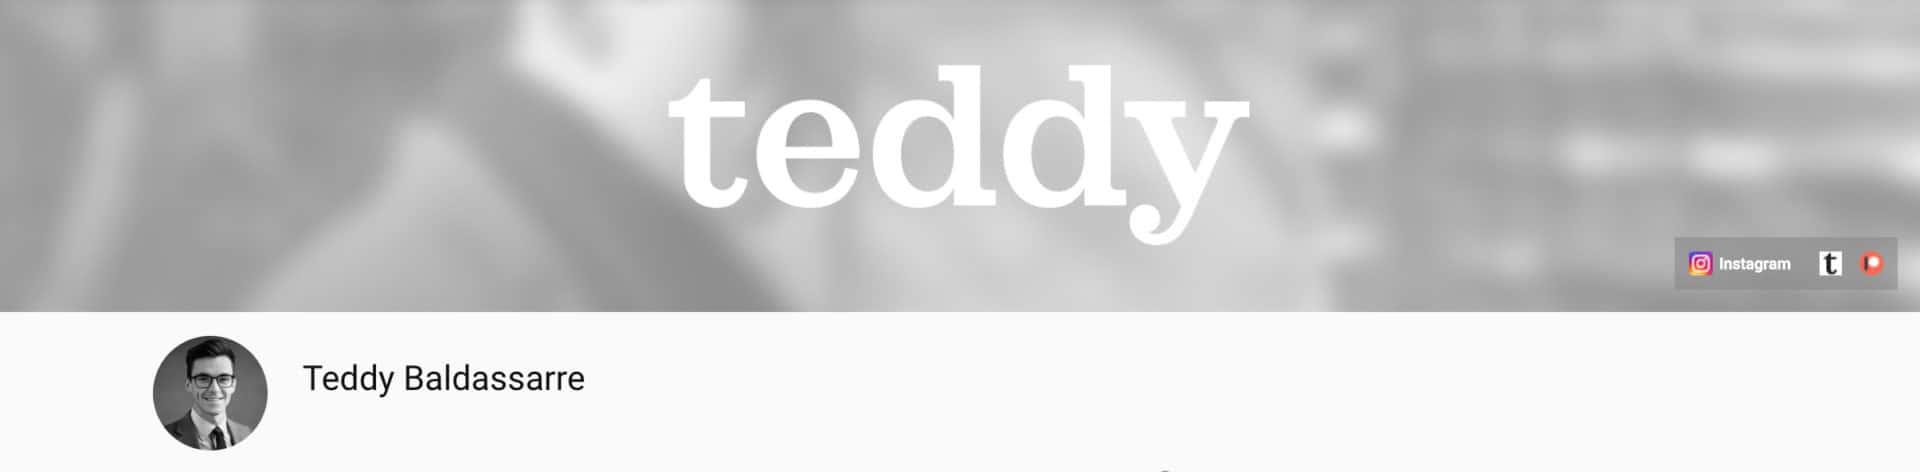 yt teddy baldassarre